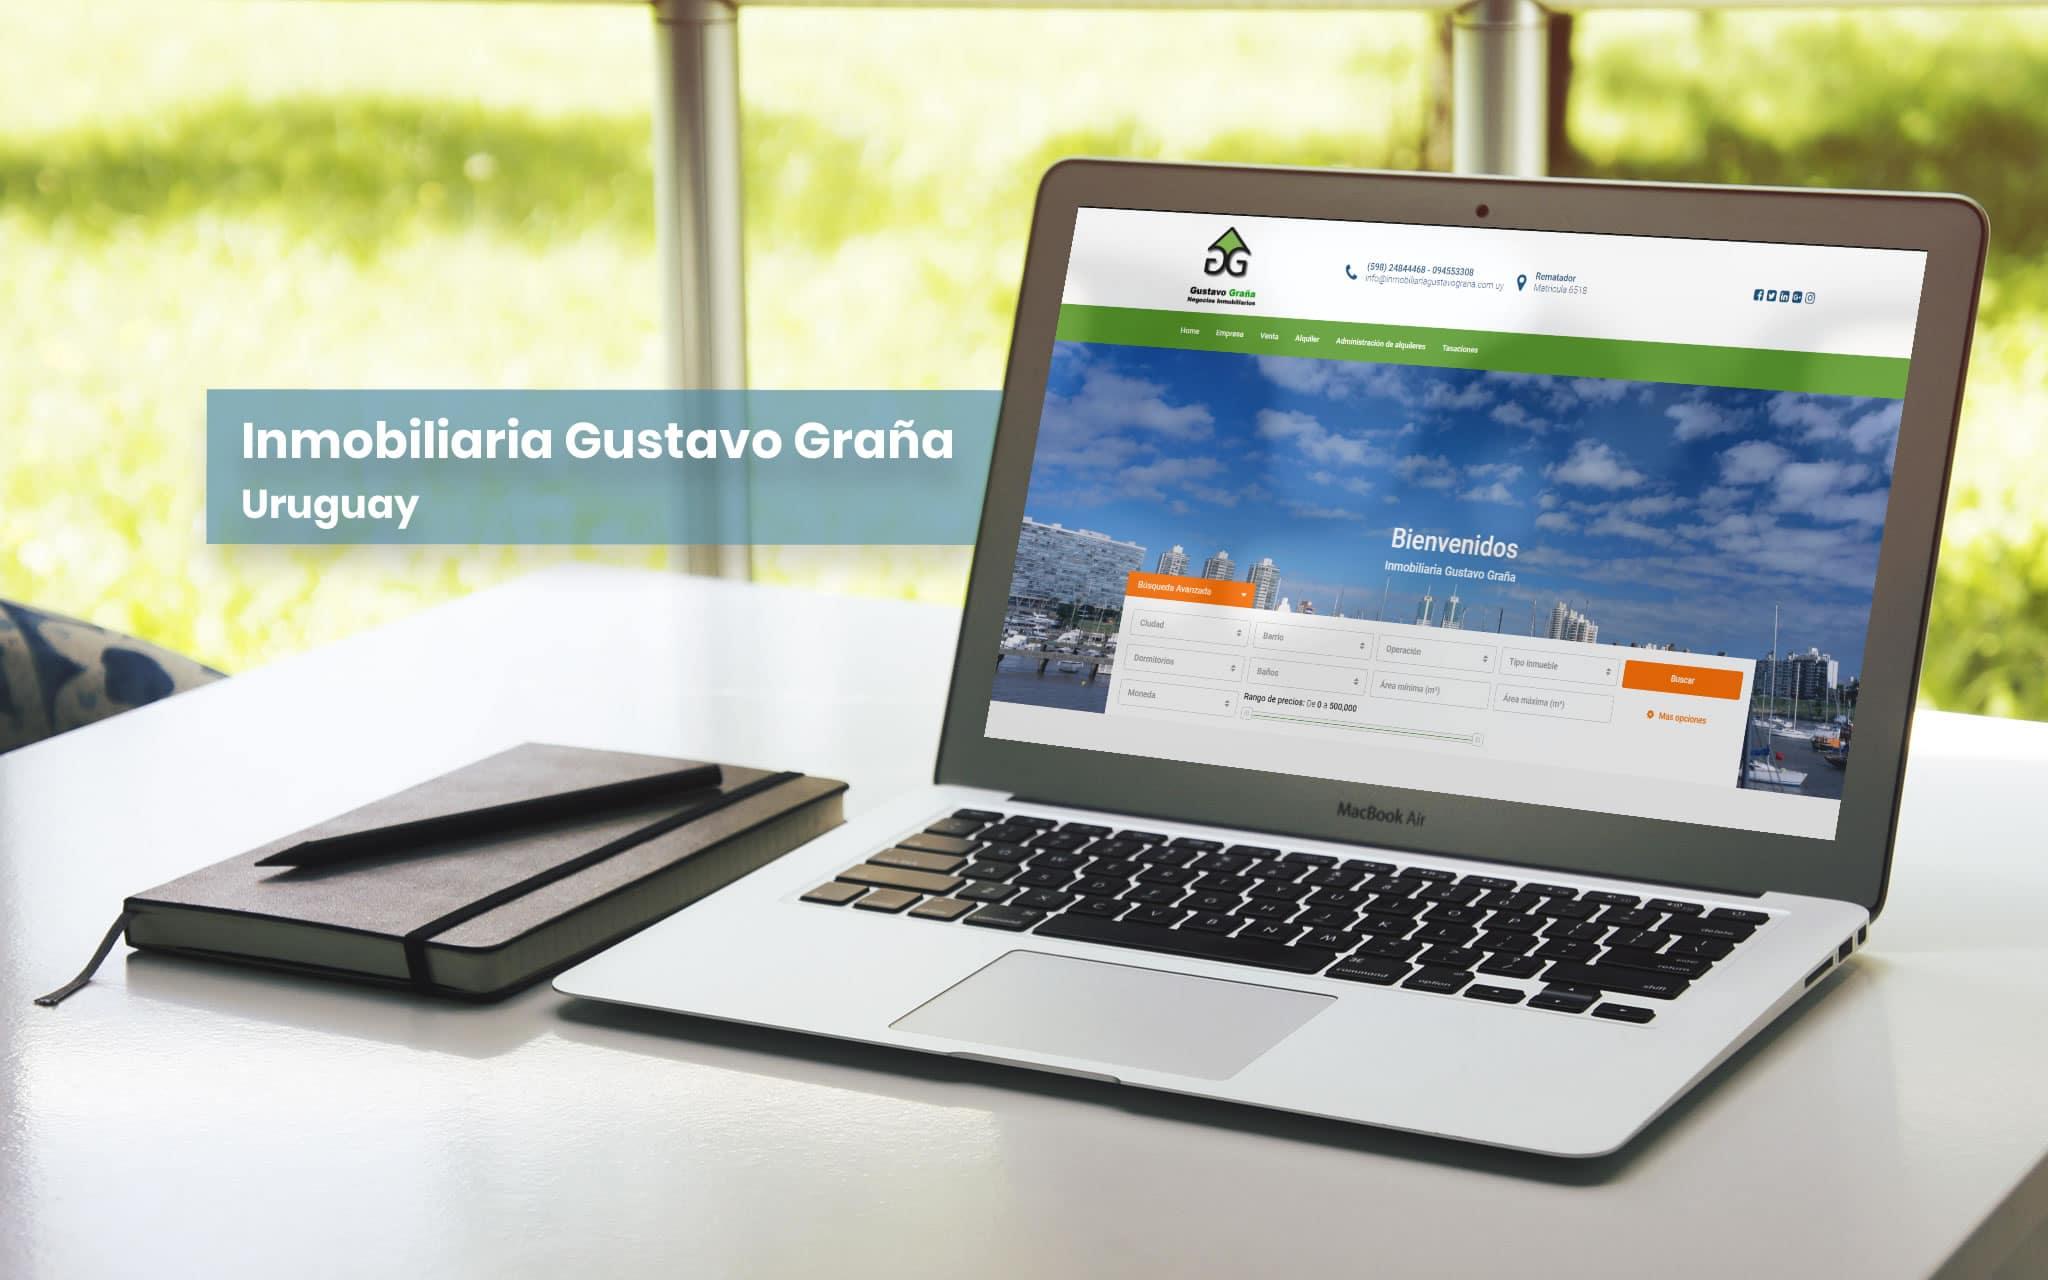 Inmobiliaria Gustavo Graña - Uruguay